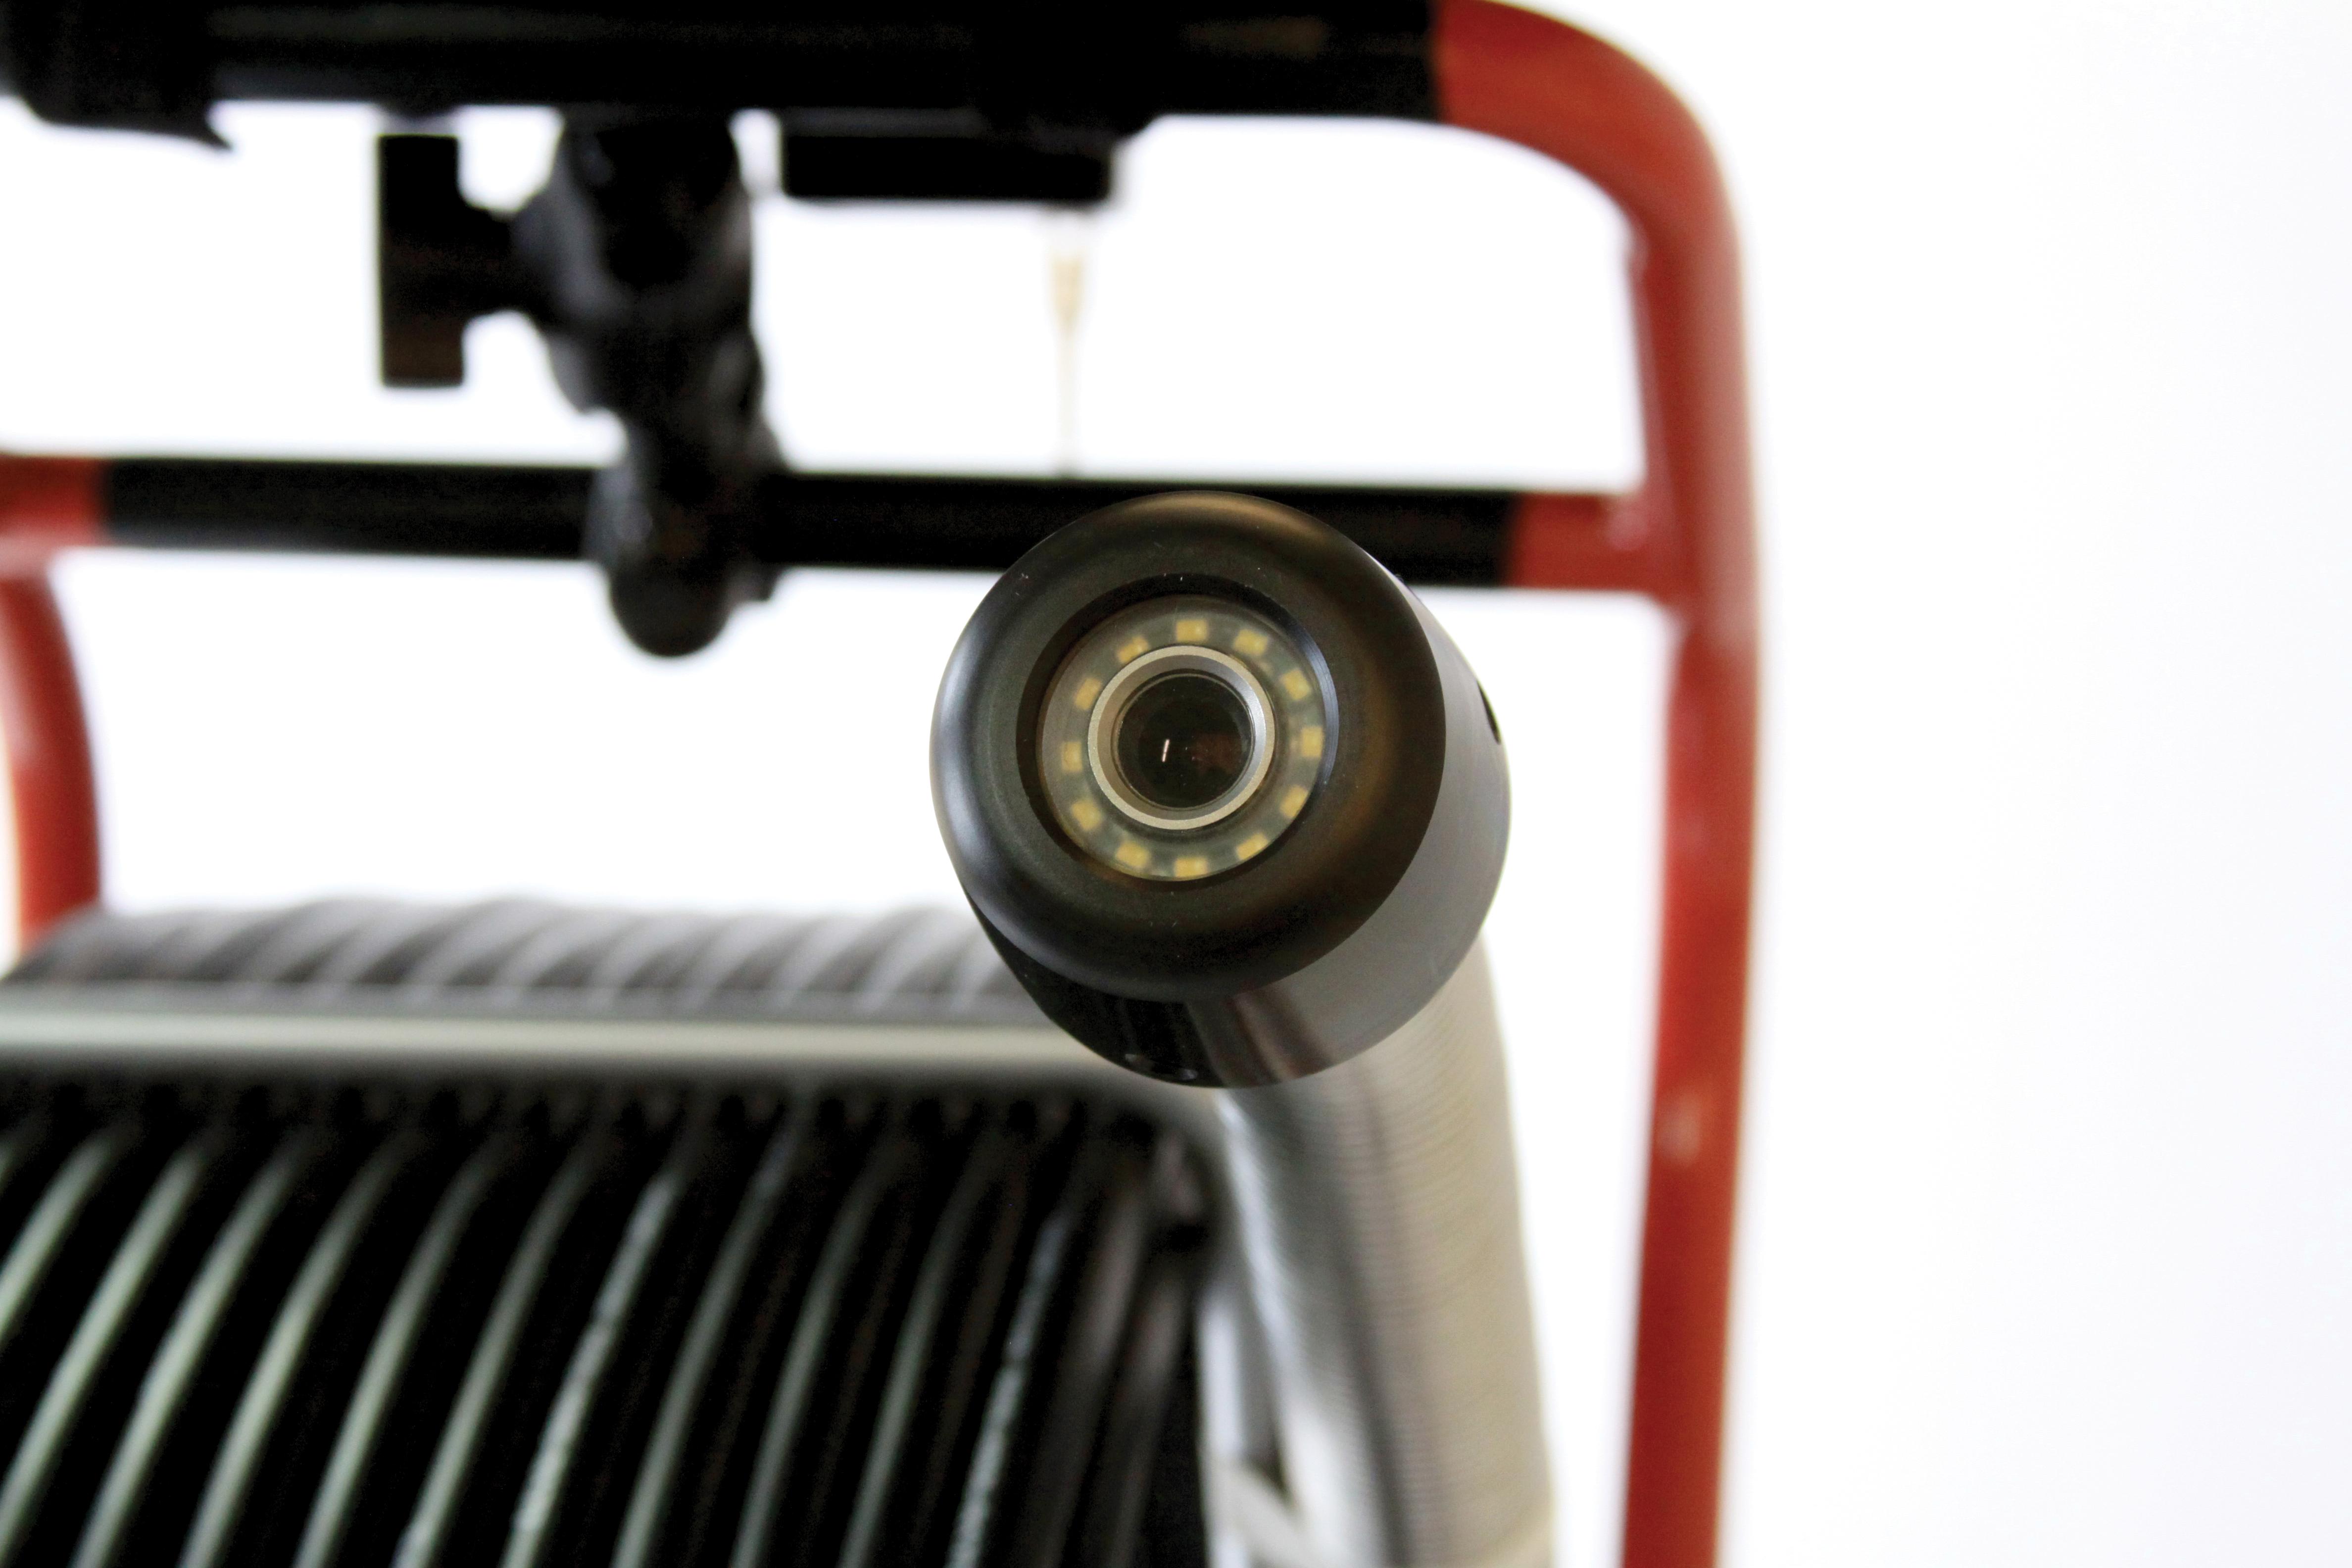 Portavision Pipe Inspection Cameras